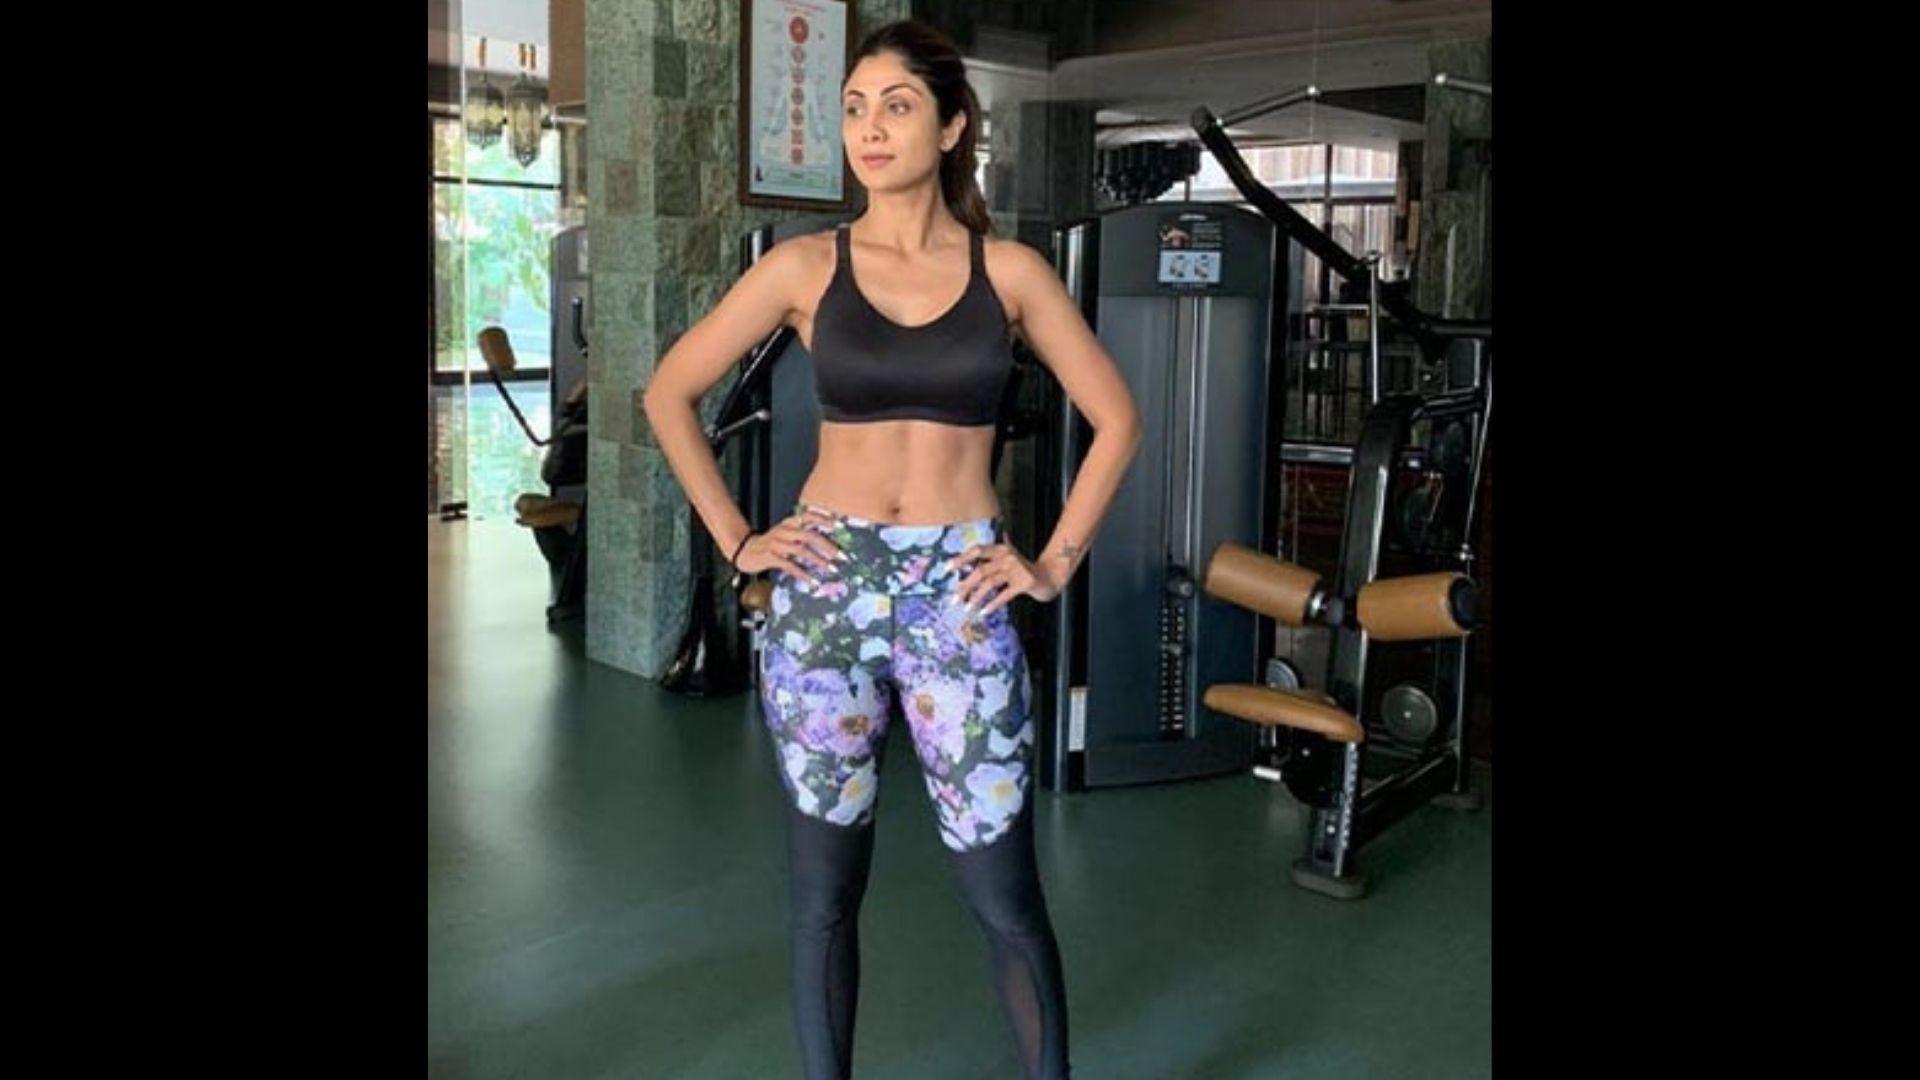 Shilpa Shetty's Motivation Fuelled Post To Kick-Off All The Monday Blues – Watch